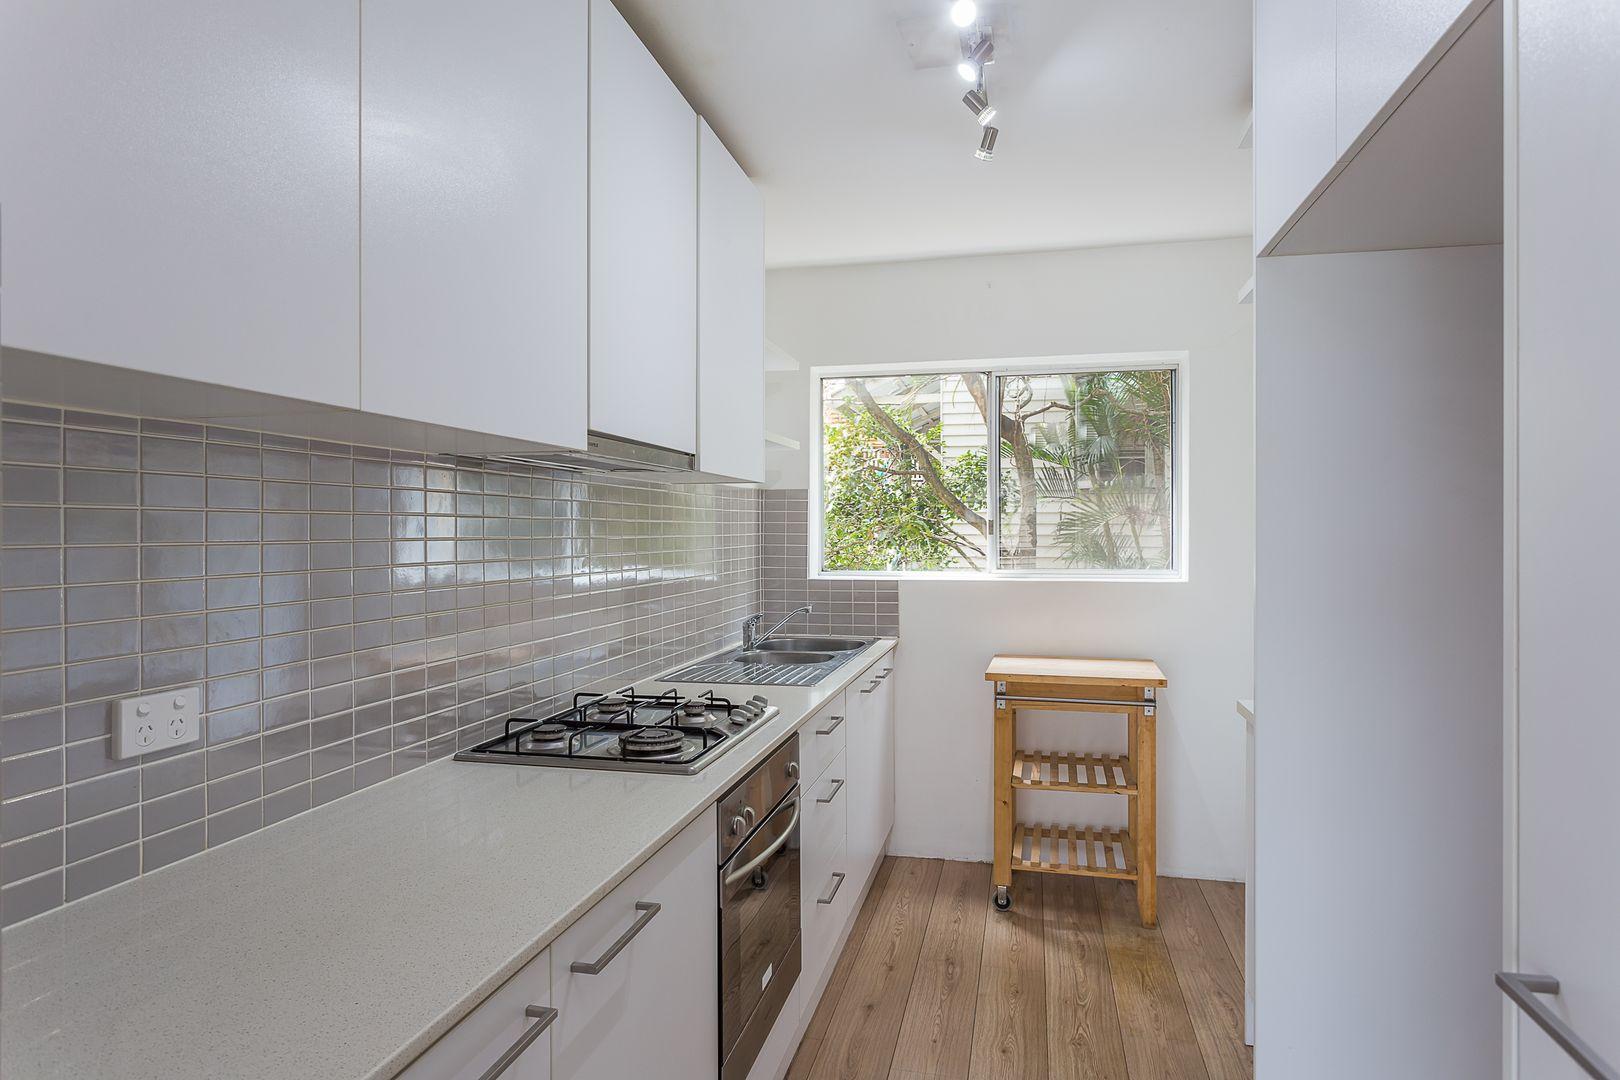 2/17 Hunter Street, Greenslopes QLD 4120, Image 0